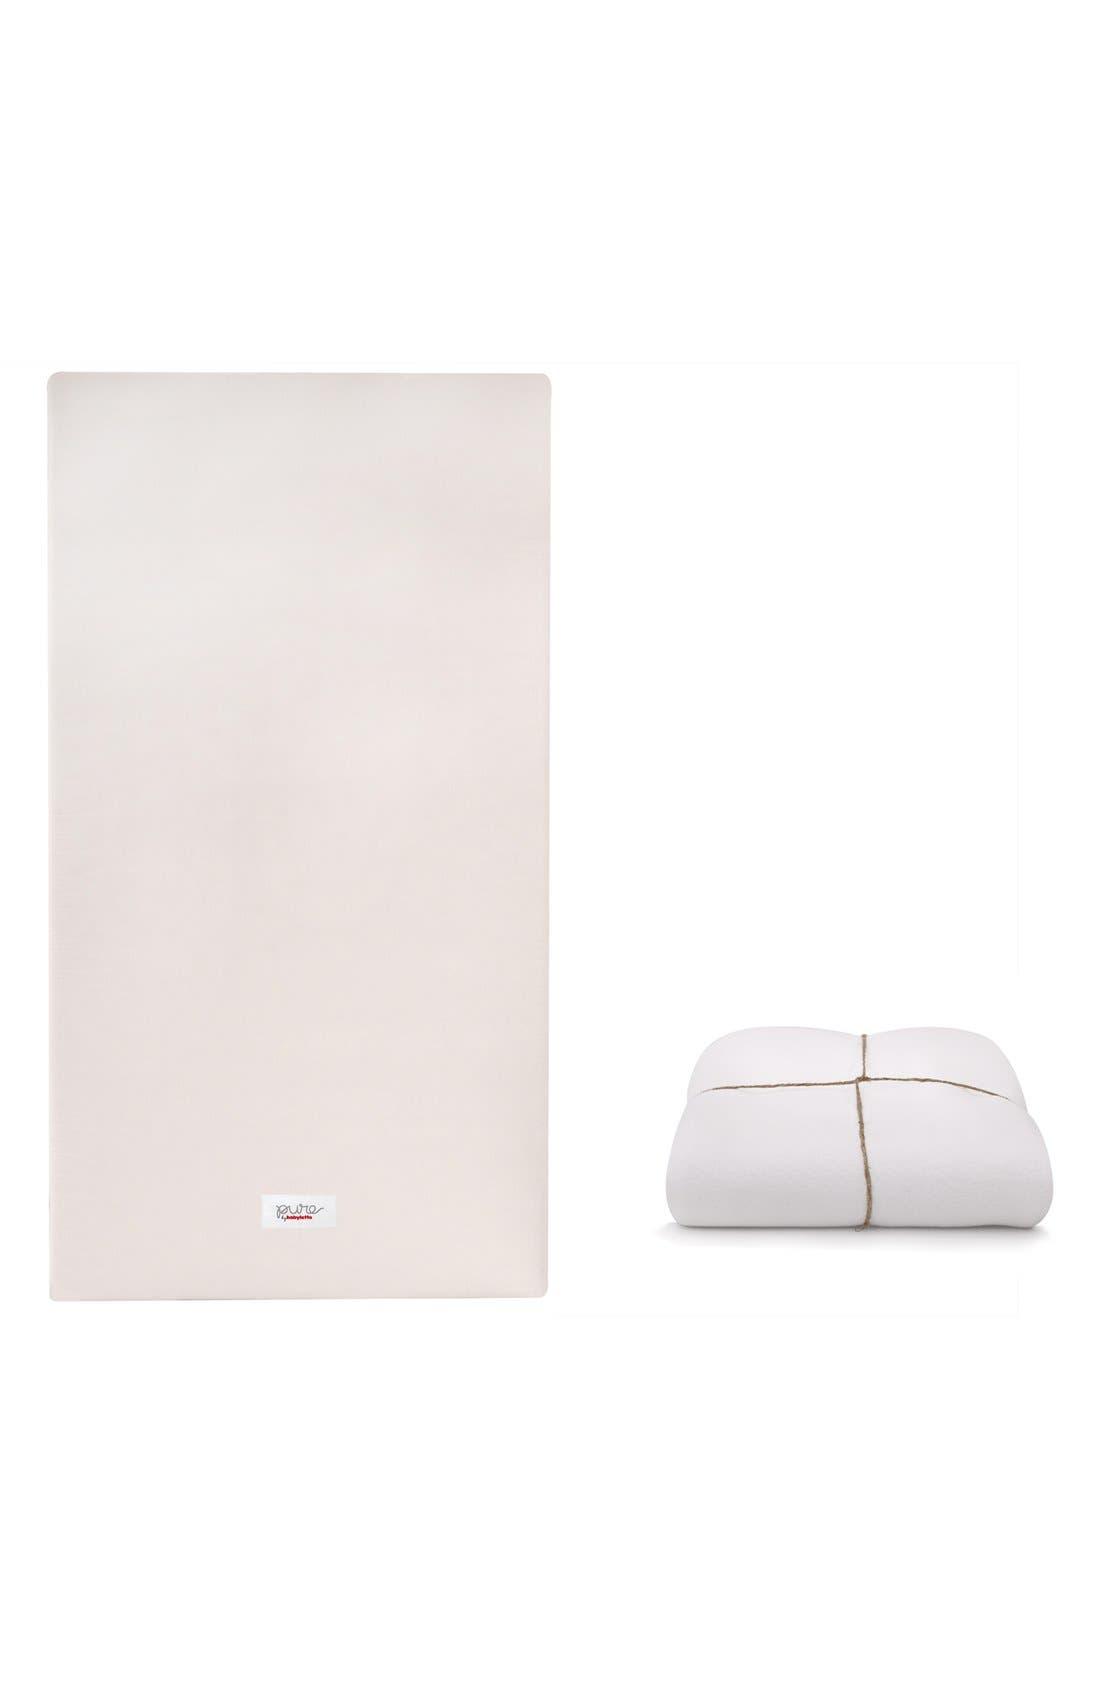 'Coco Core' Nontoxic Crib Mattress & Water Repellent SMART Cover,                             Main thumbnail 1, color,                             100